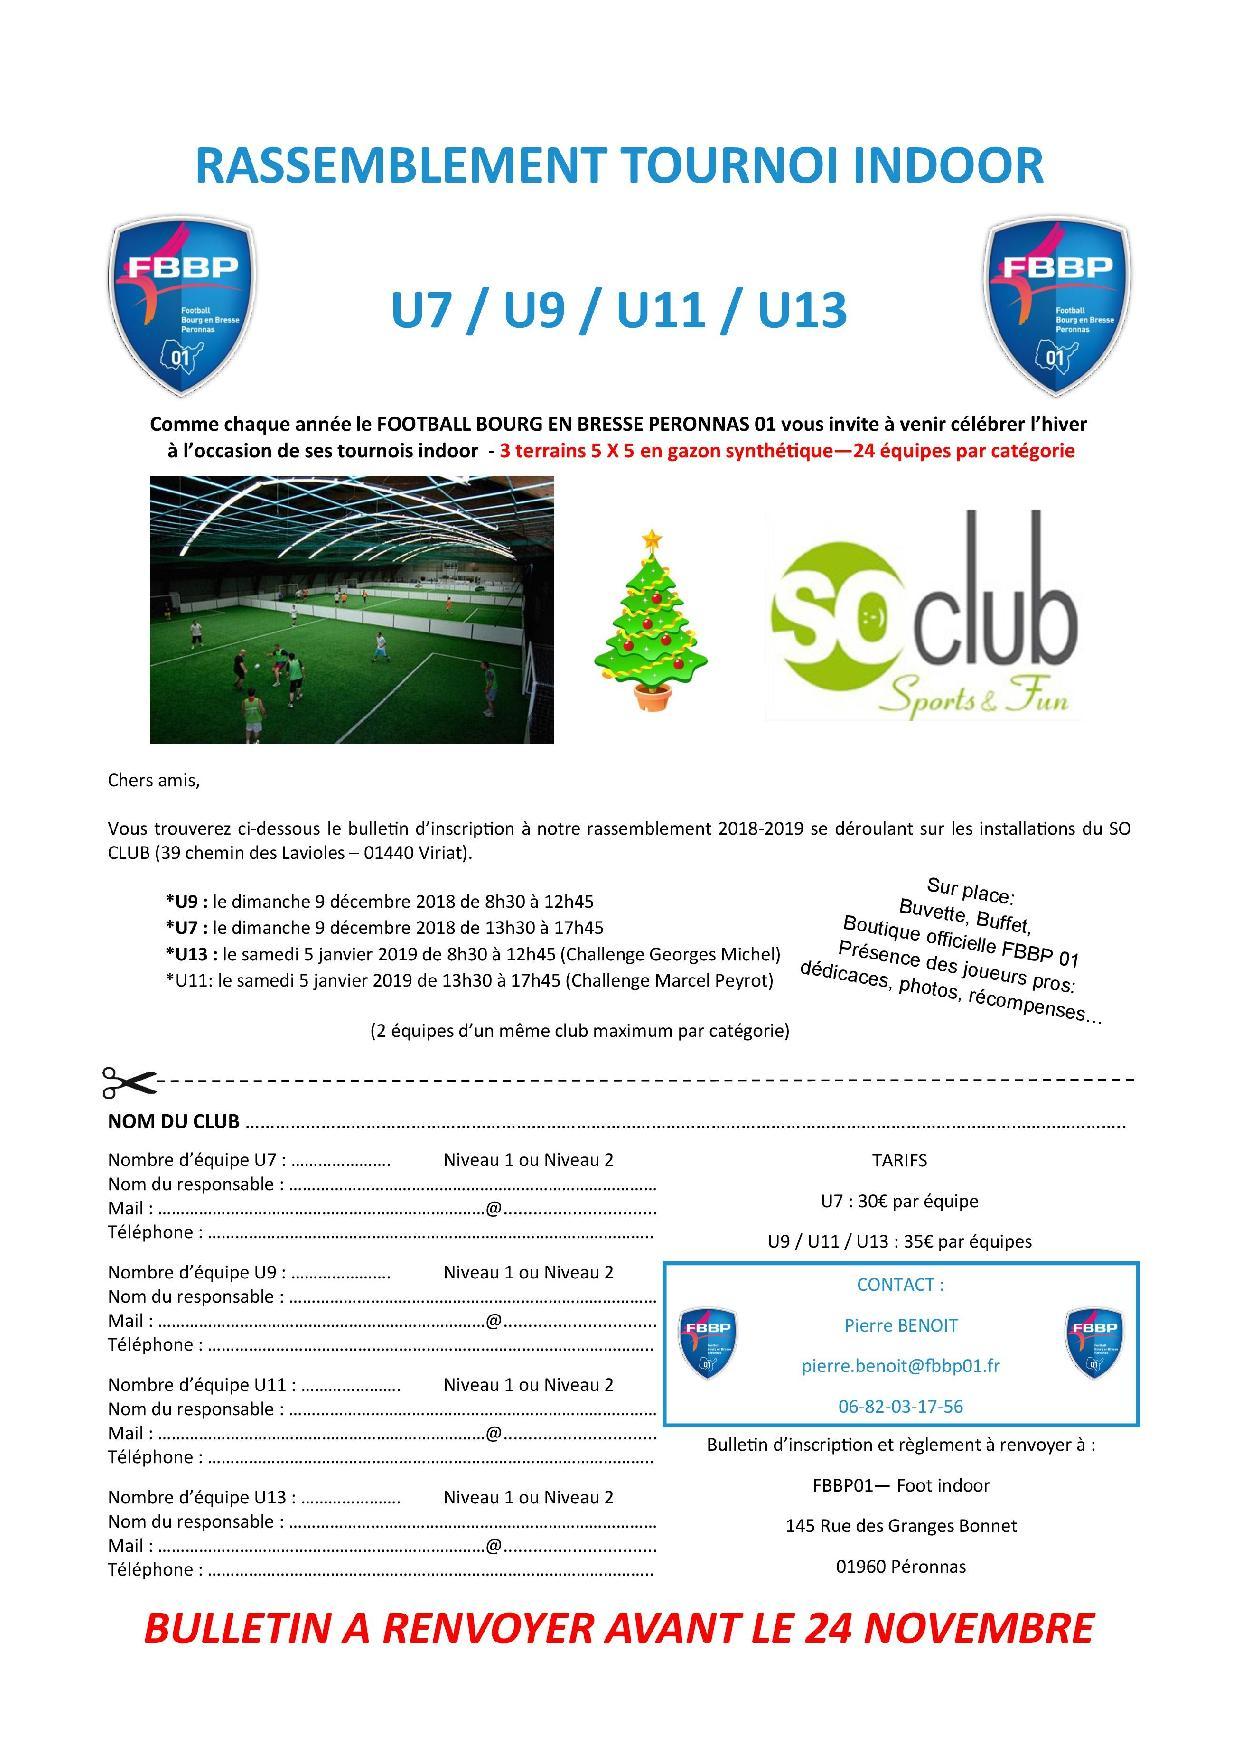 FBBP - Football Bourg-en-Bresse Péronnas 01